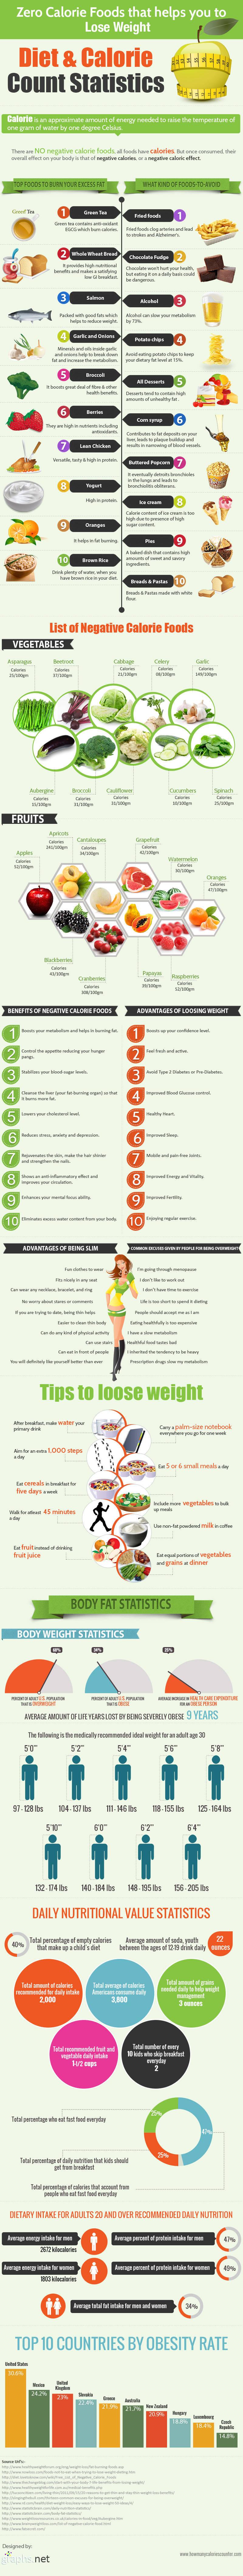 healthy low calorie foods